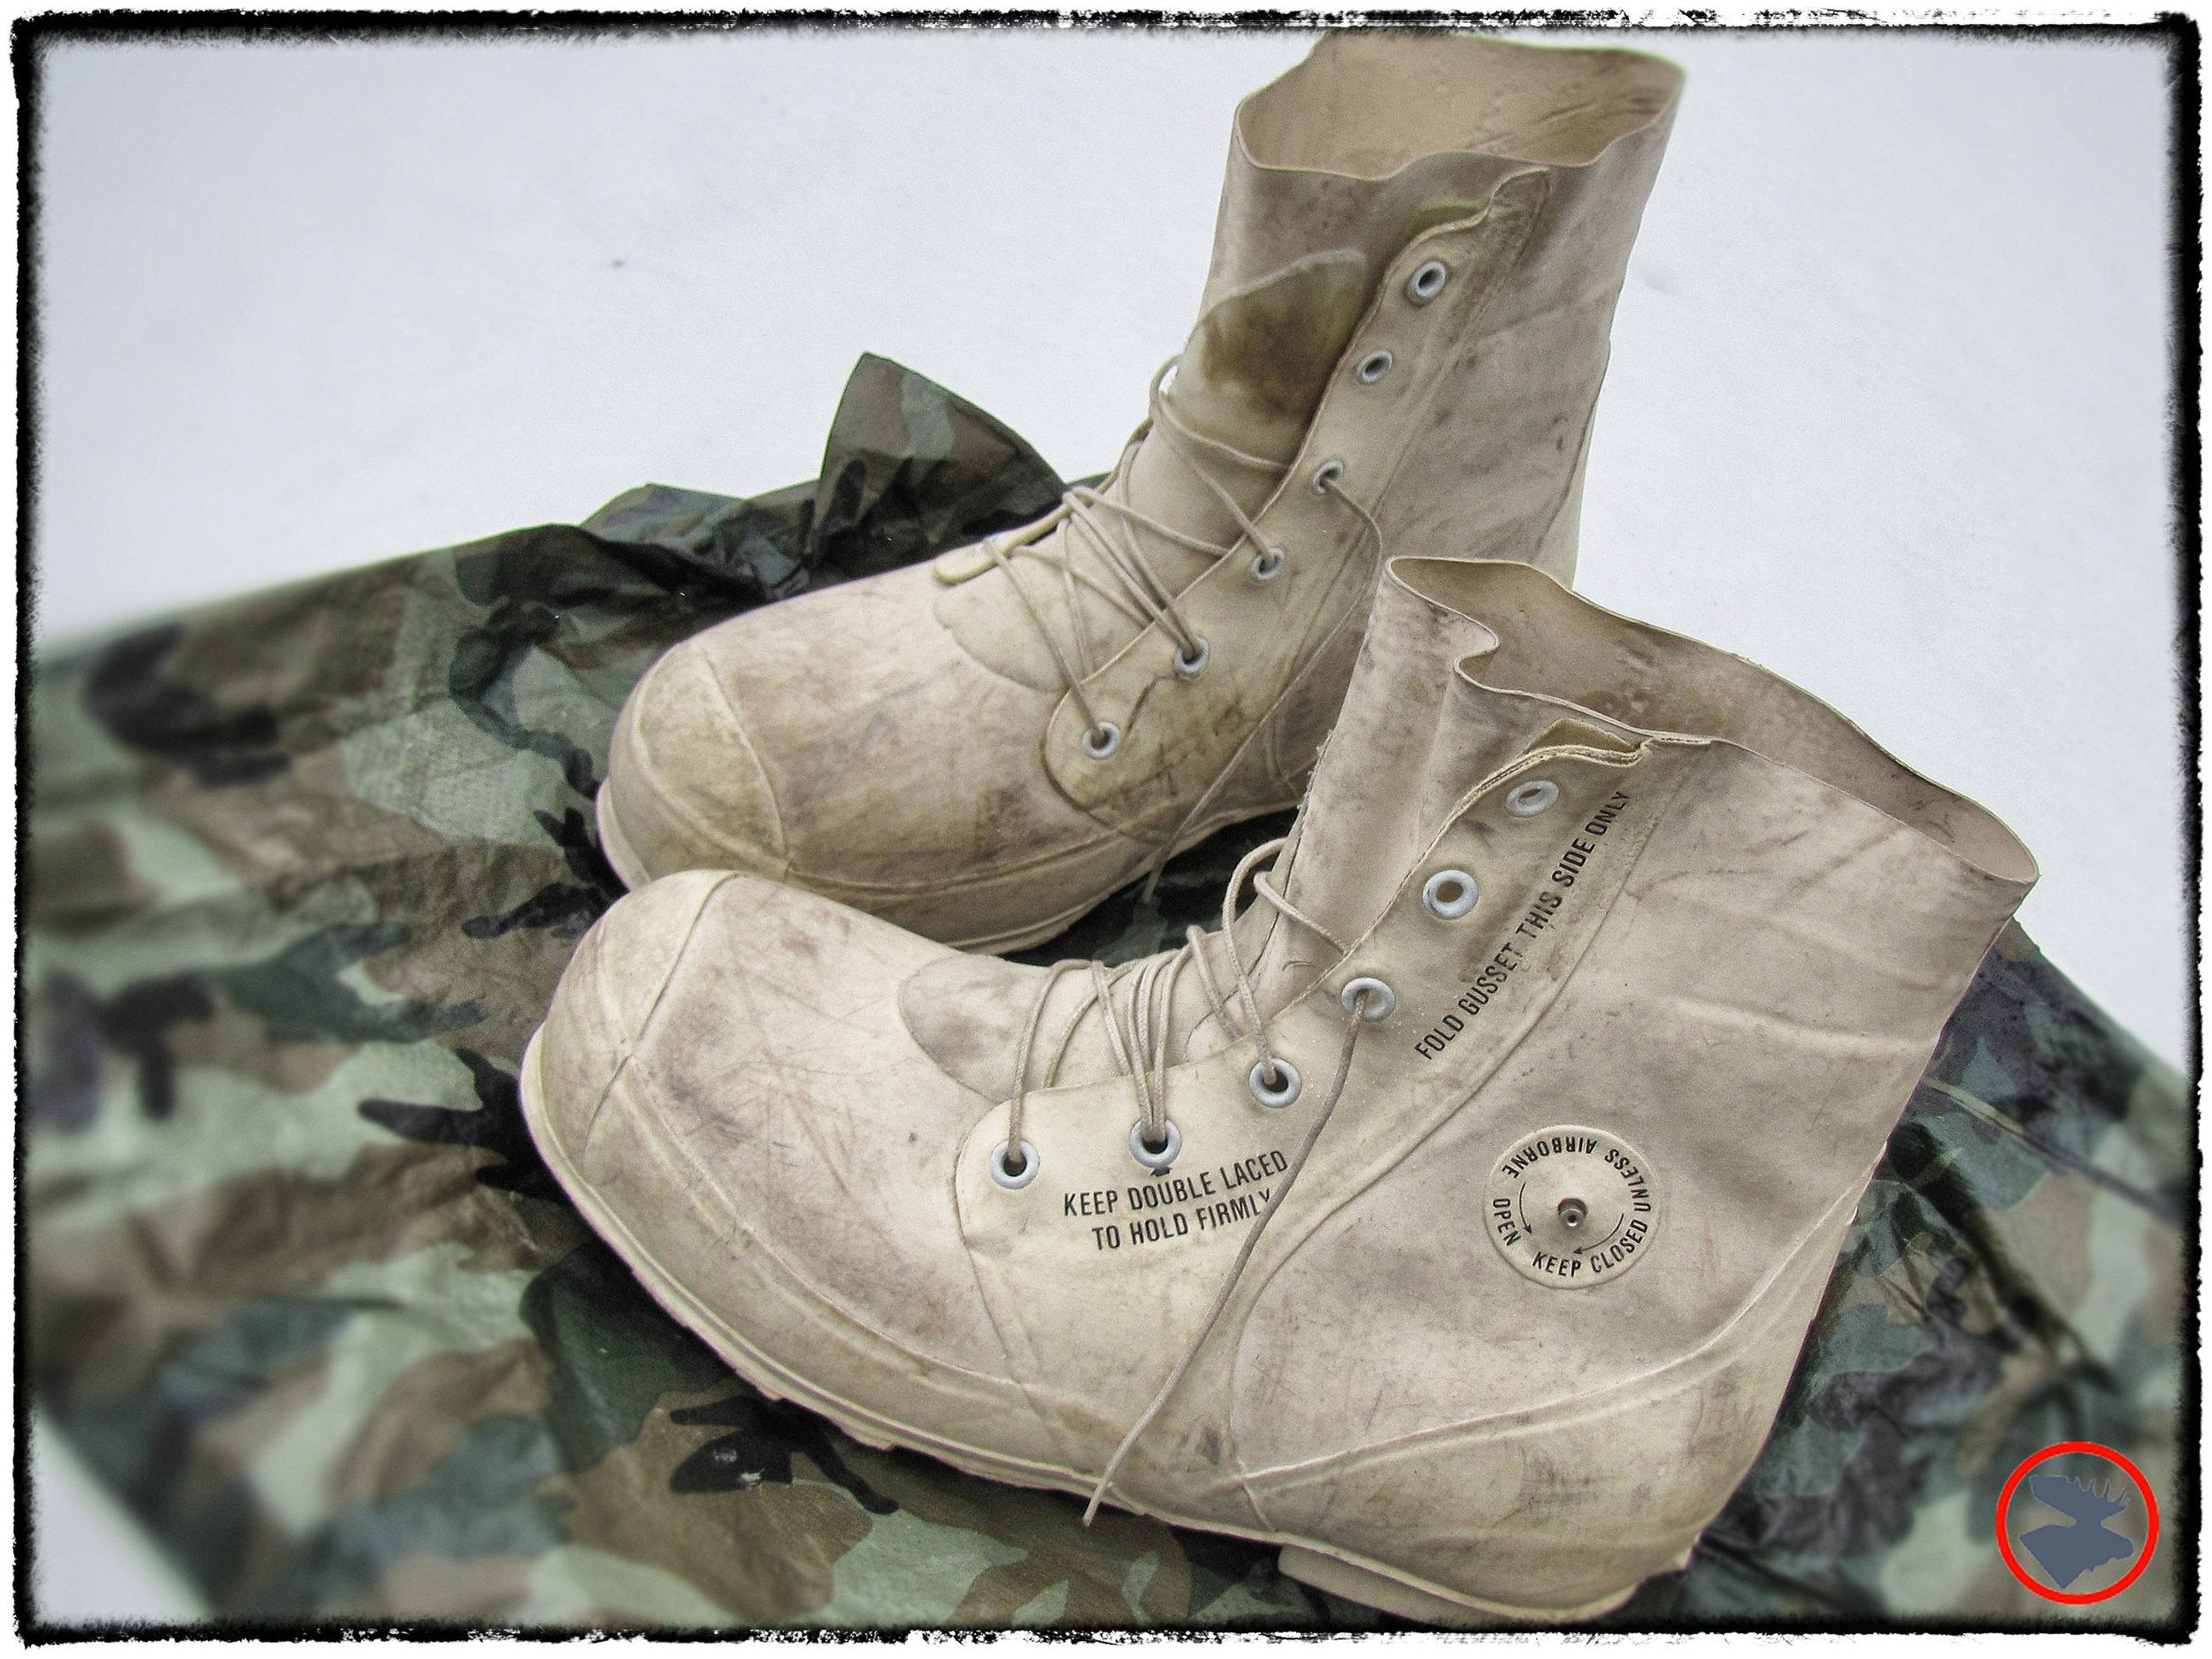 b66928022 Bunny Boots: Fail-Safe Winter Footwear — Bull Moose Patrol